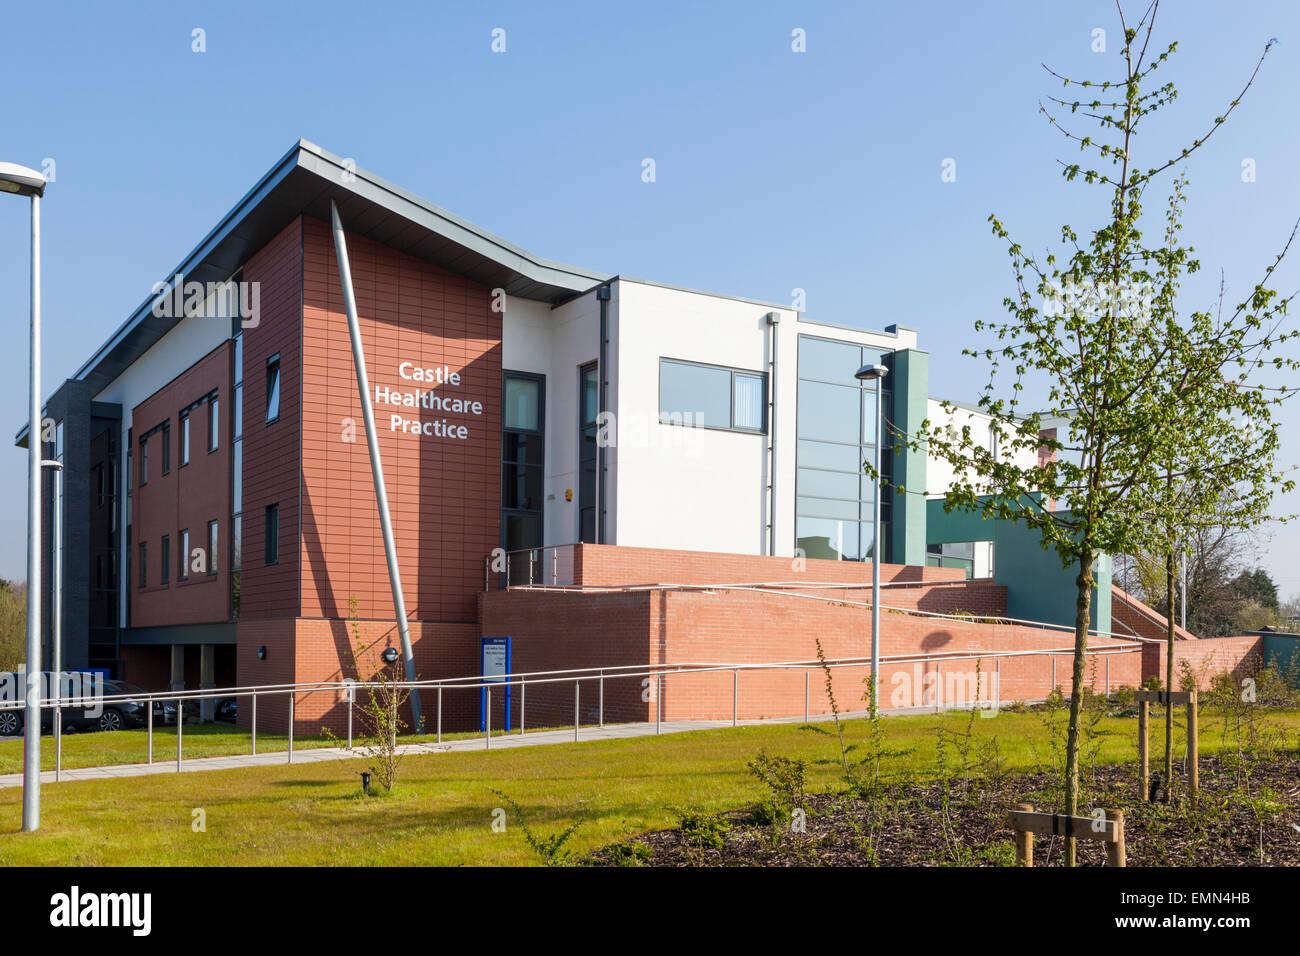 Castle Healthcare Practice at Embankment Primary Care, West Bridgford, Nottinghamshire, England, UK - Stock Image